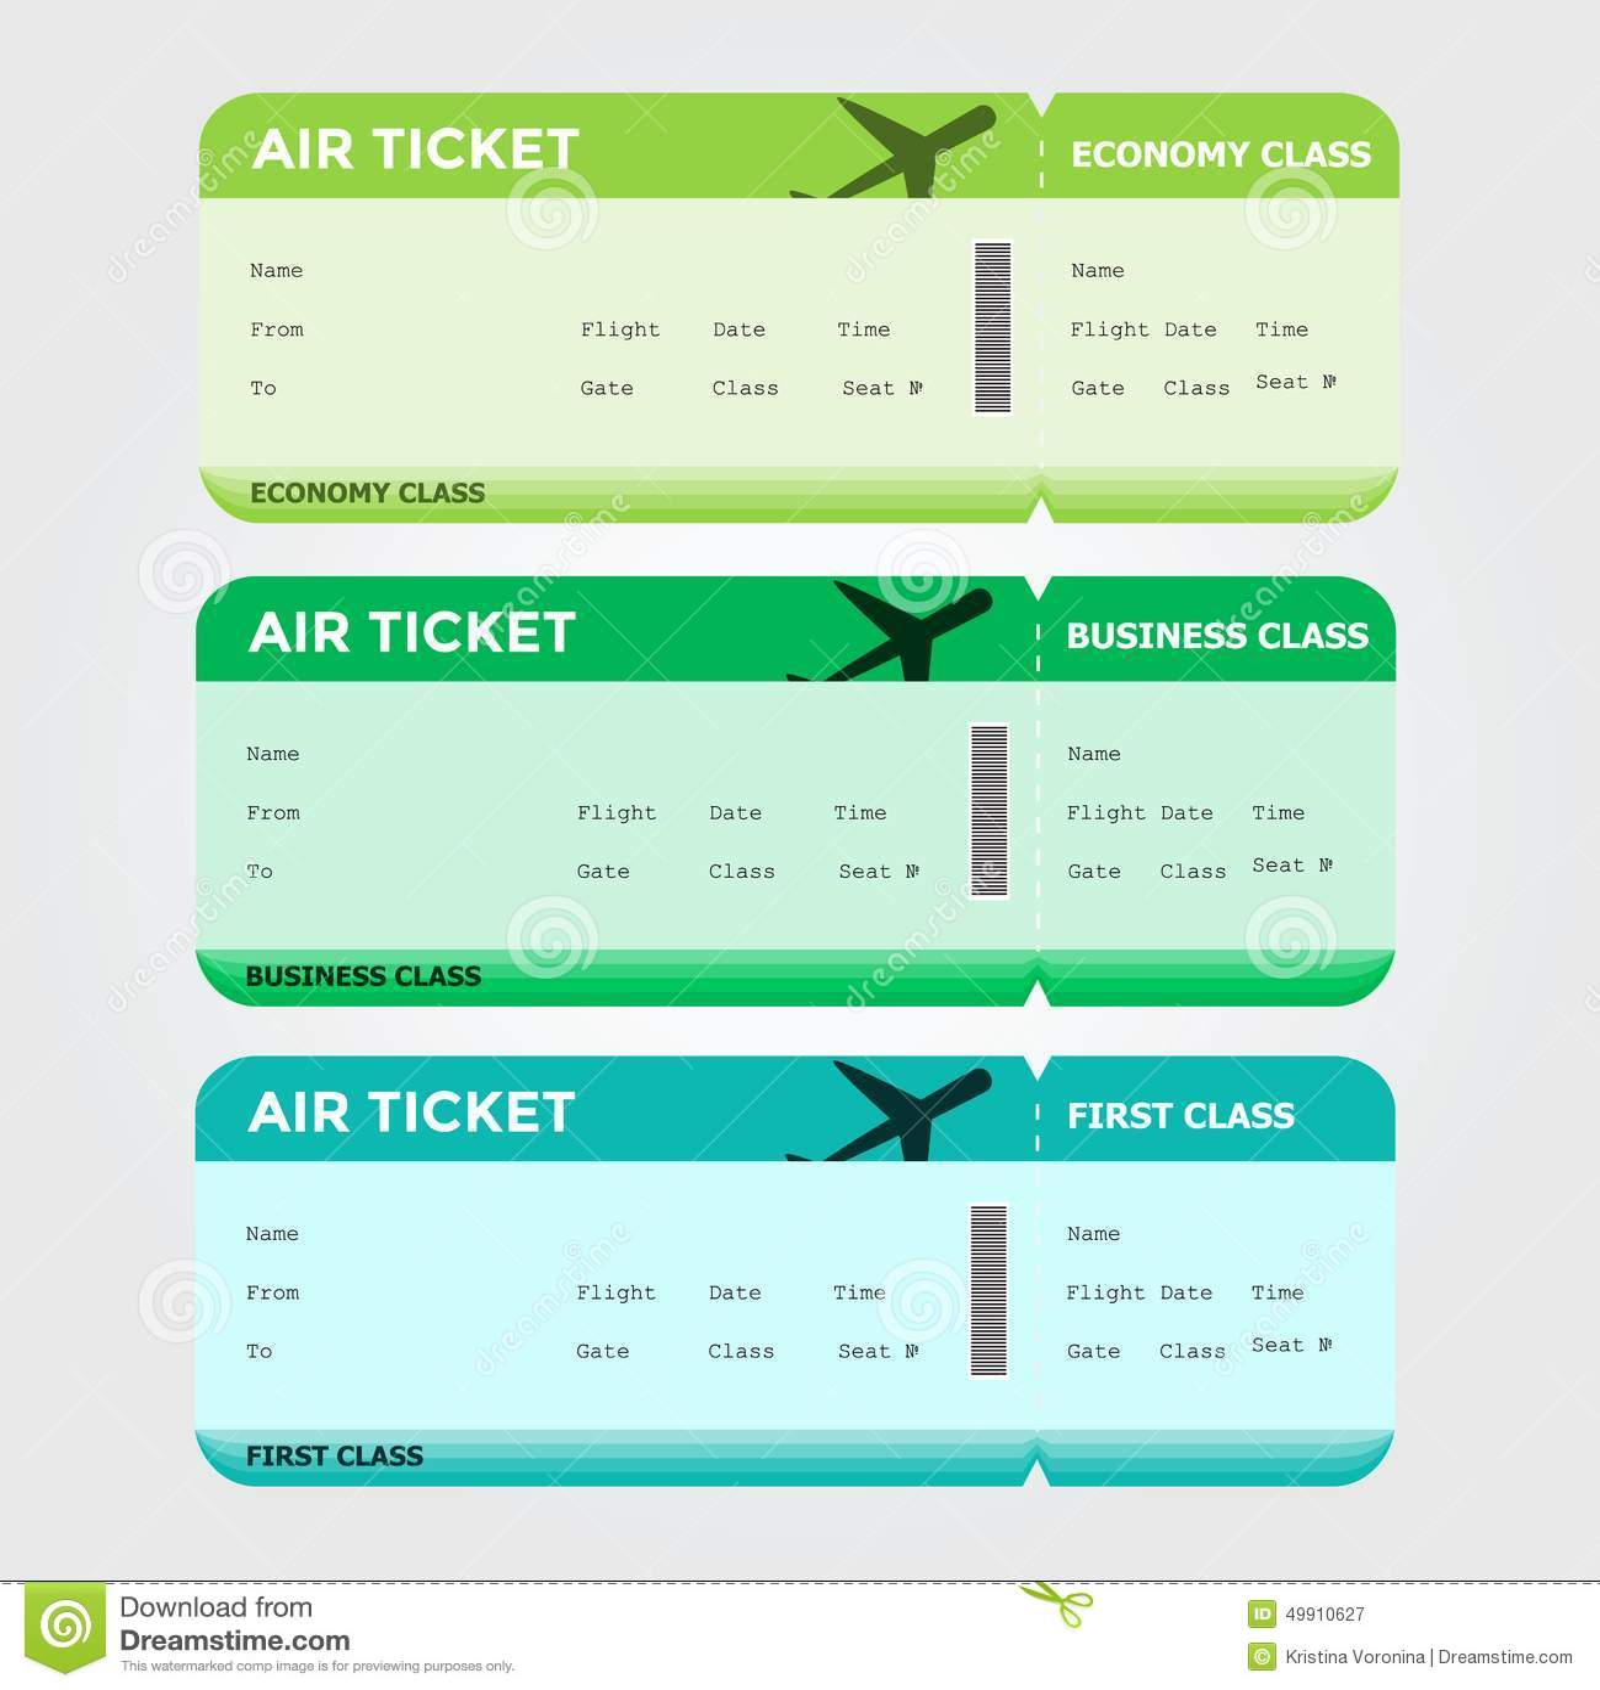 trois classes de vert vide de carte d 39 embarquement de vol illustration de vecteur image 49910627. Black Bedroom Furniture Sets. Home Design Ideas